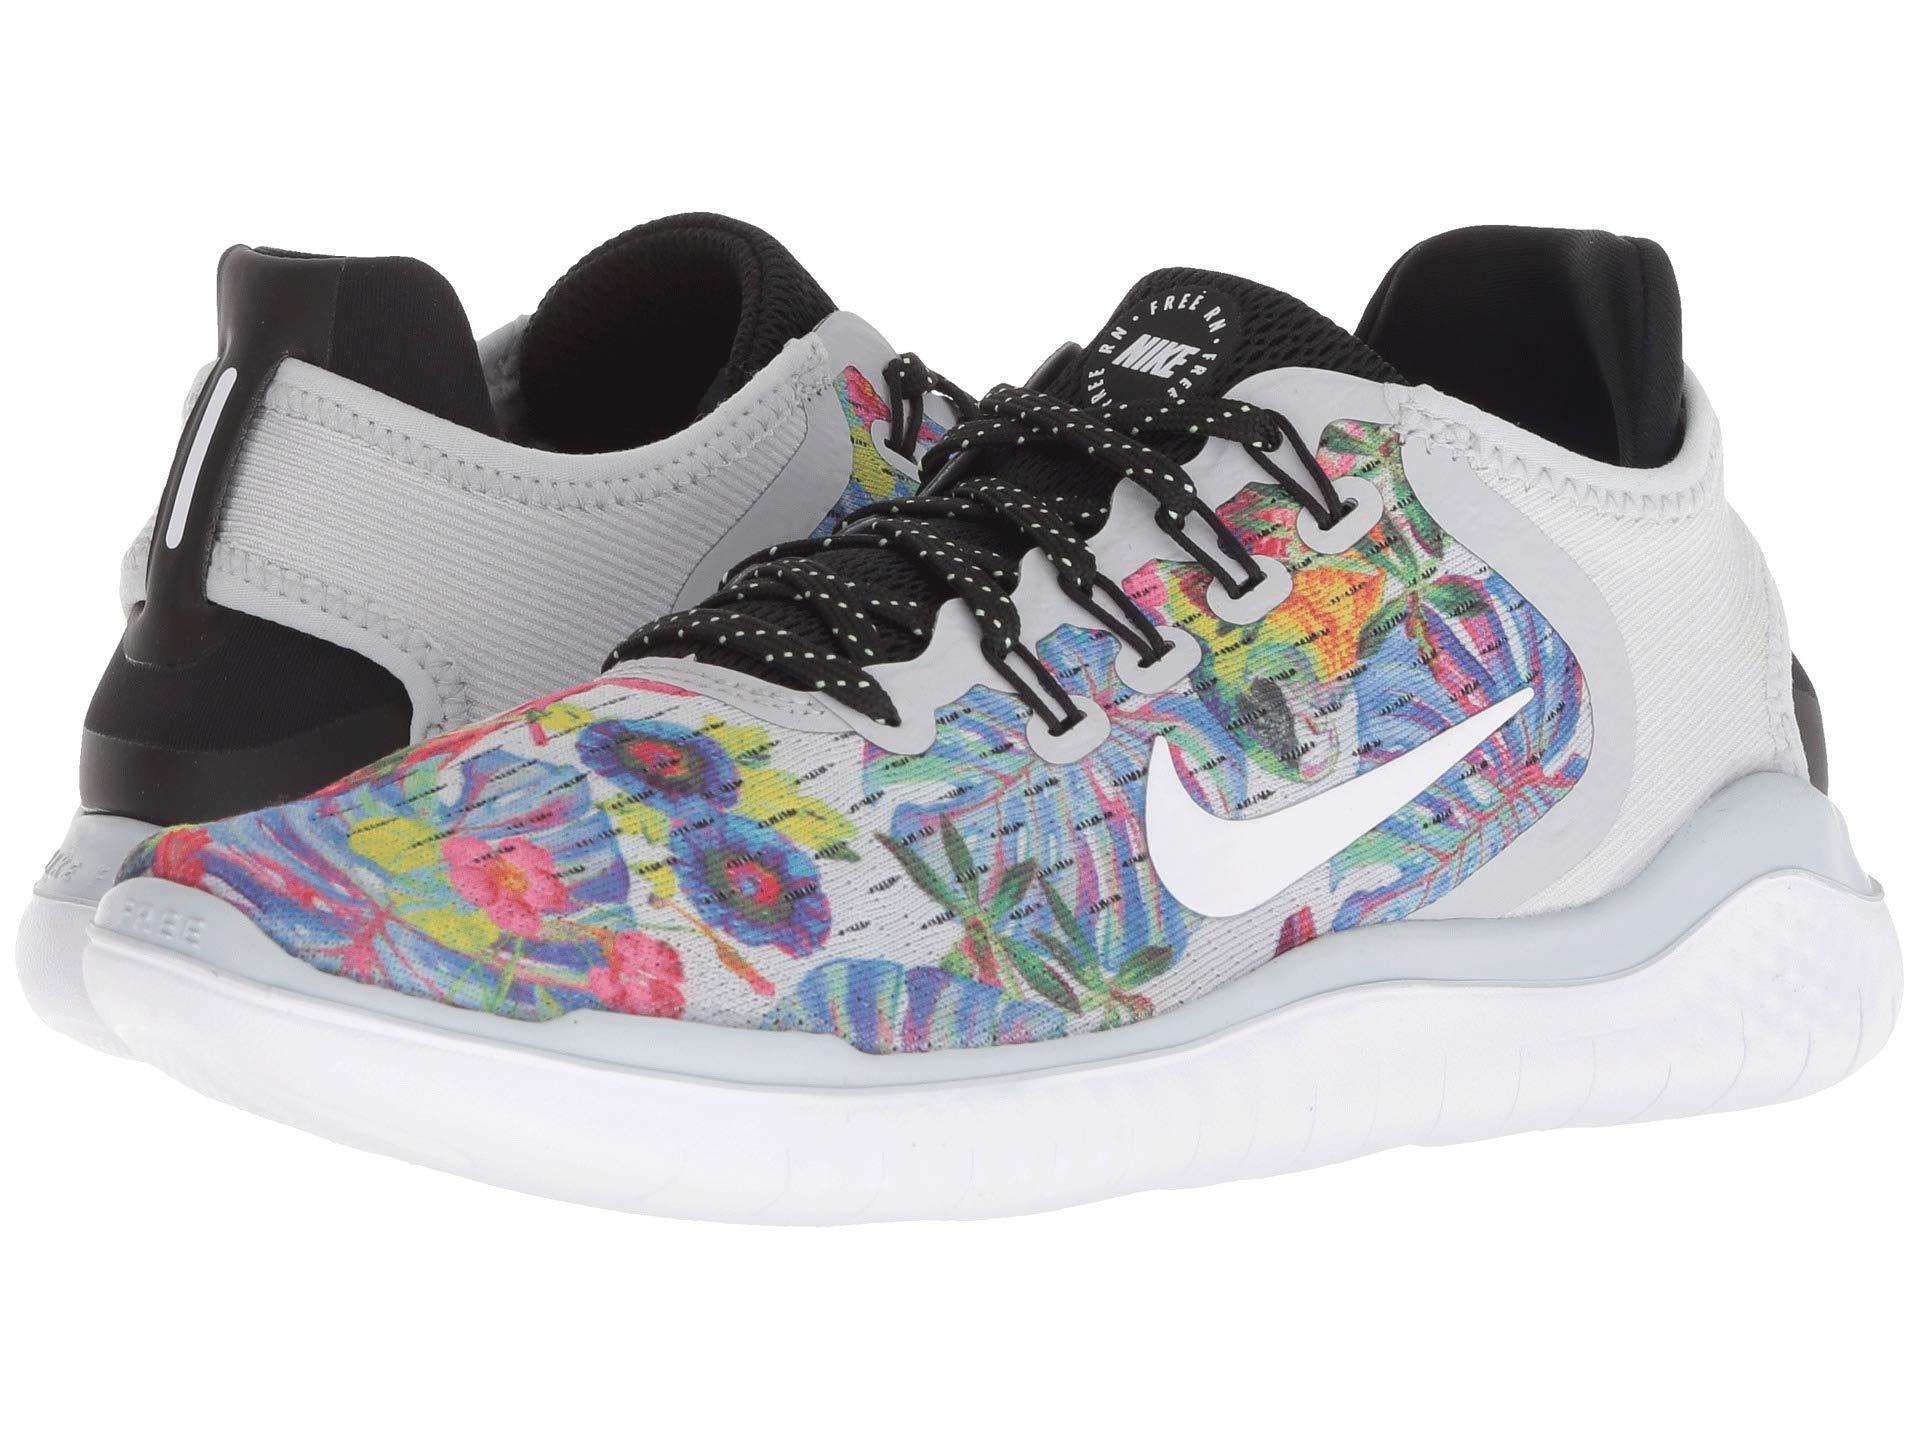 2b05095f6c8e Lyst - Nike Free Rn 2018 Gpx Rs (pure Platinum white black) Women s ...